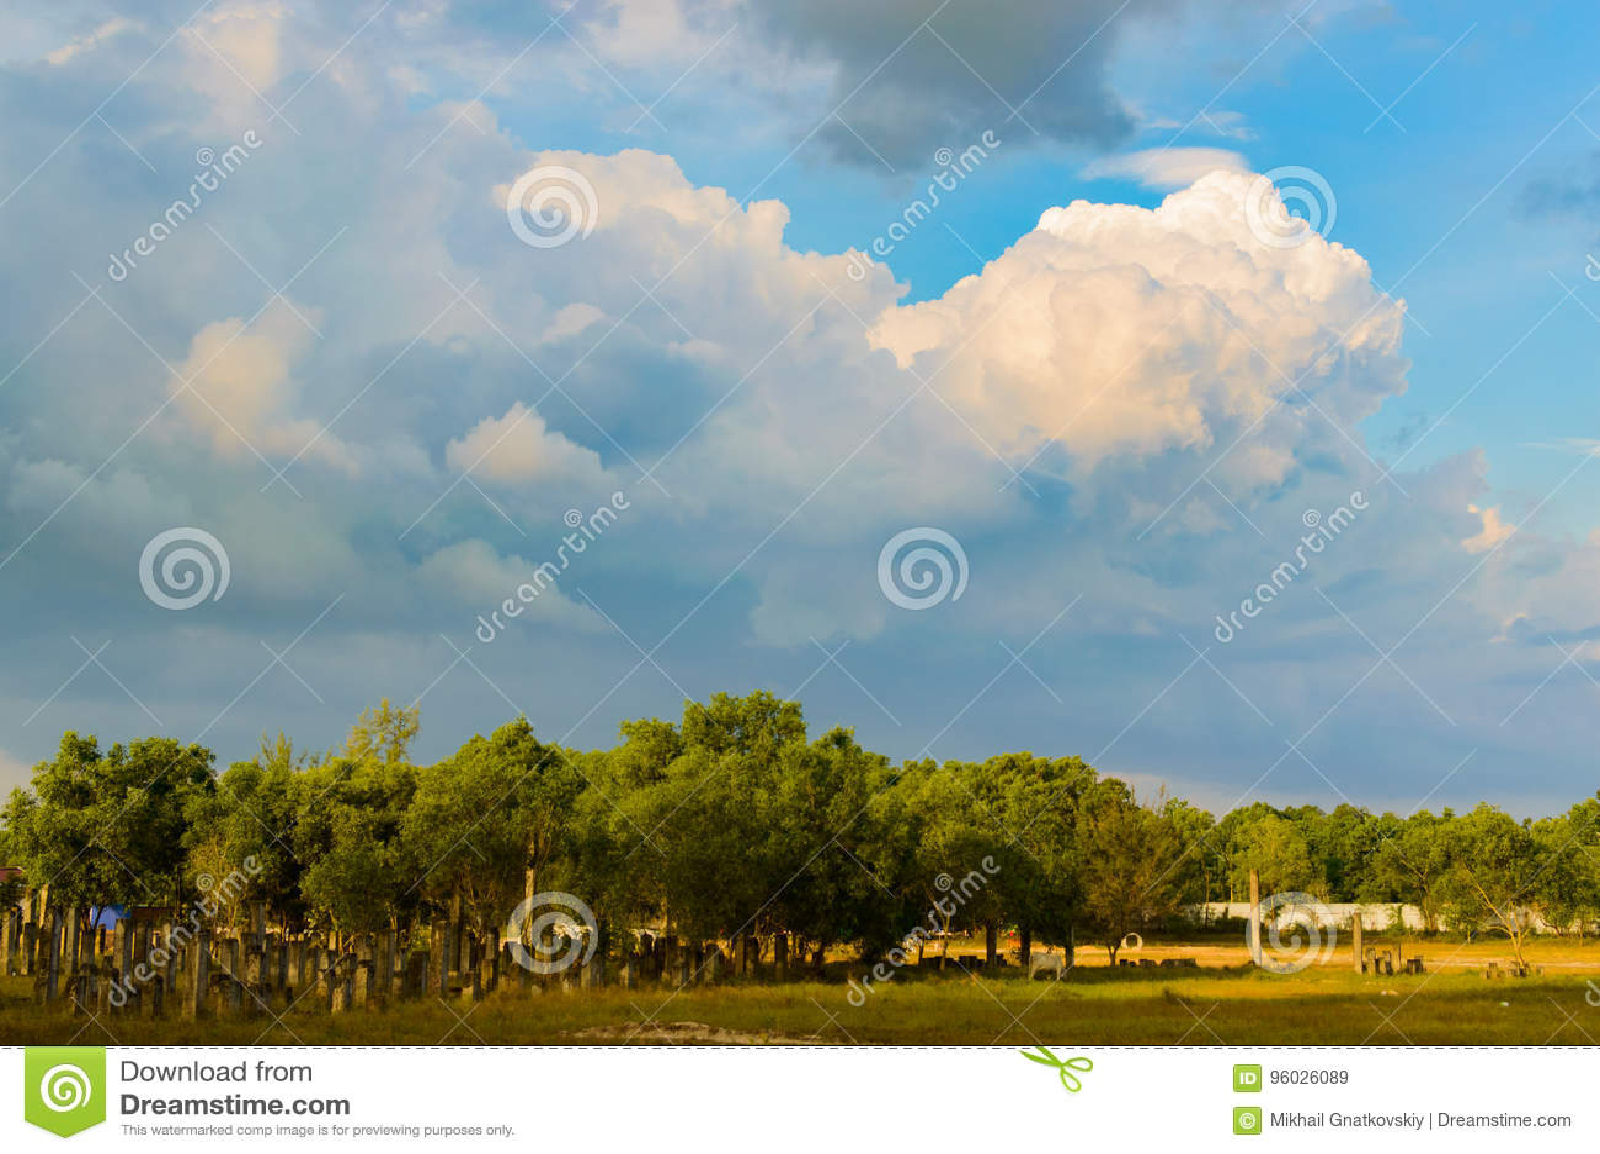 Monumentalne ogromne chmury